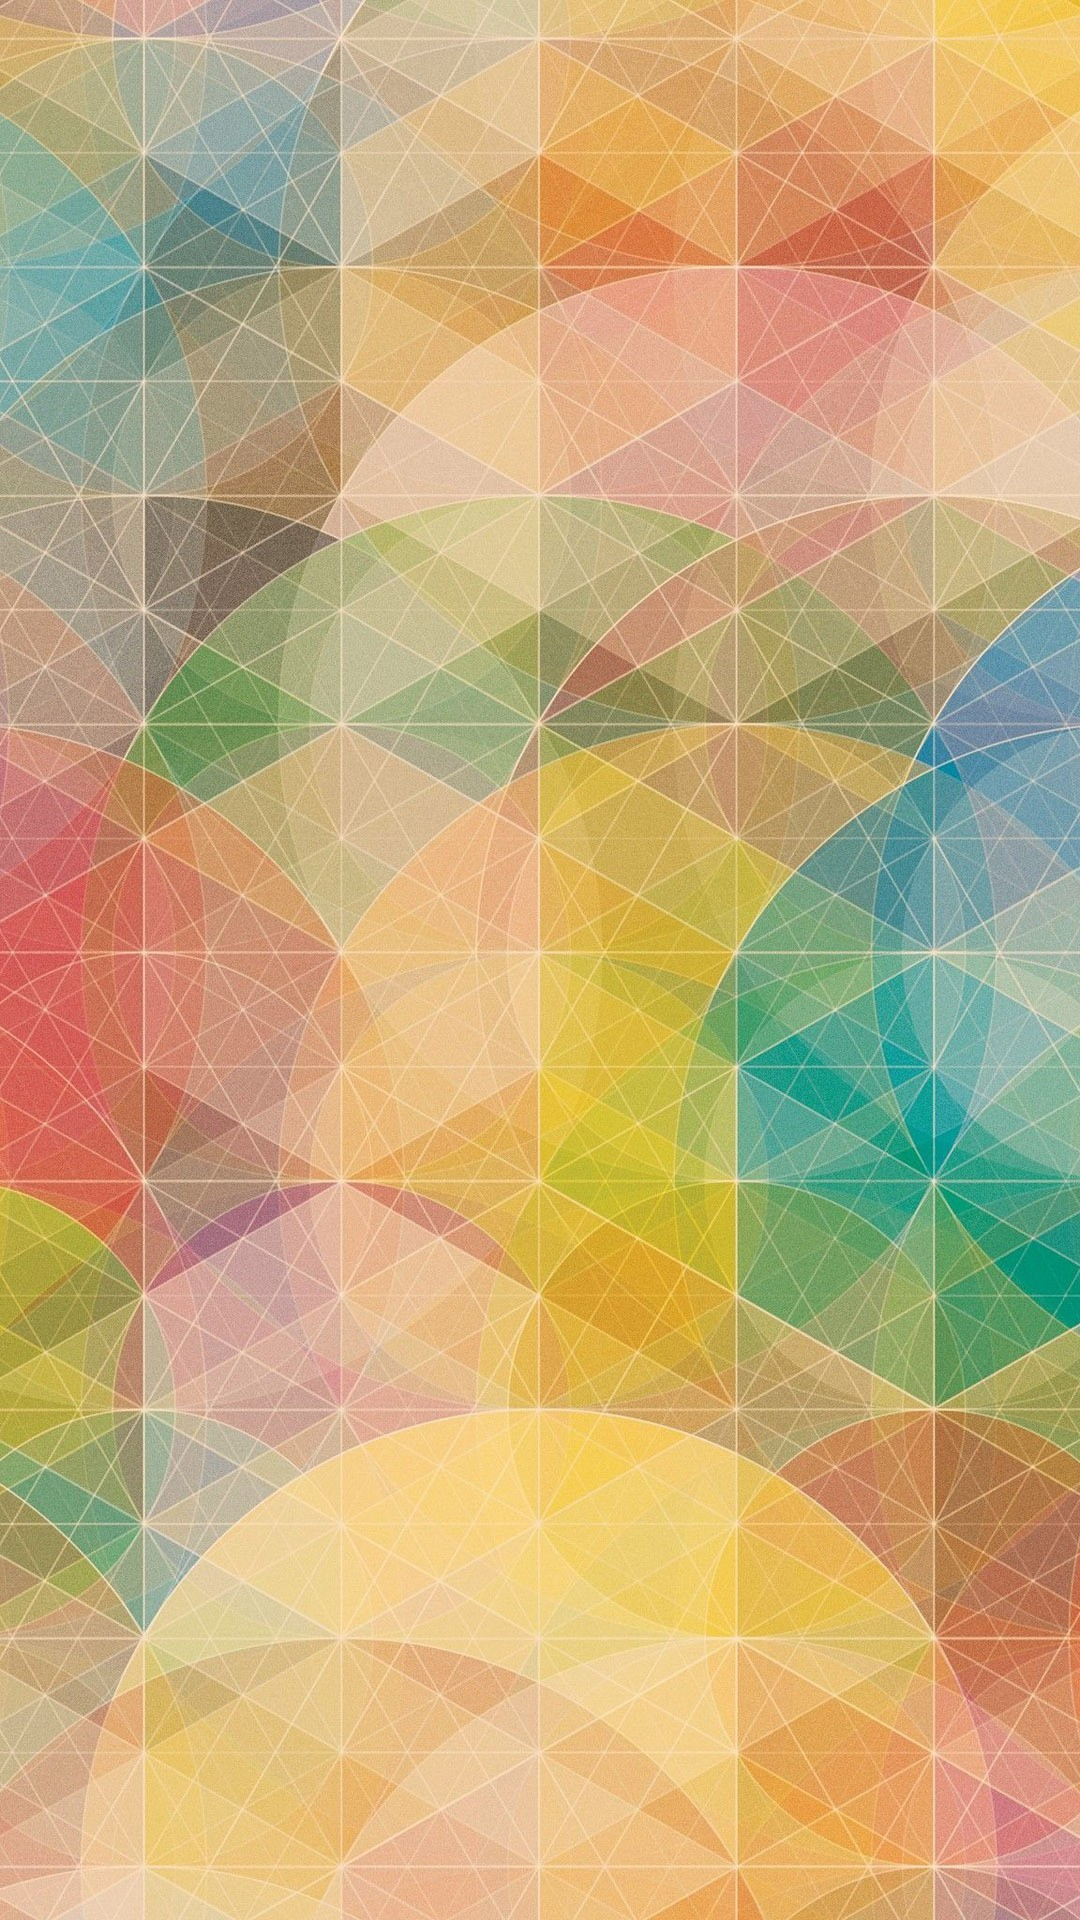 Geometric Shape iPhone 6 plus wallpaper – simple, blocks #Geometric #iPhone  #6